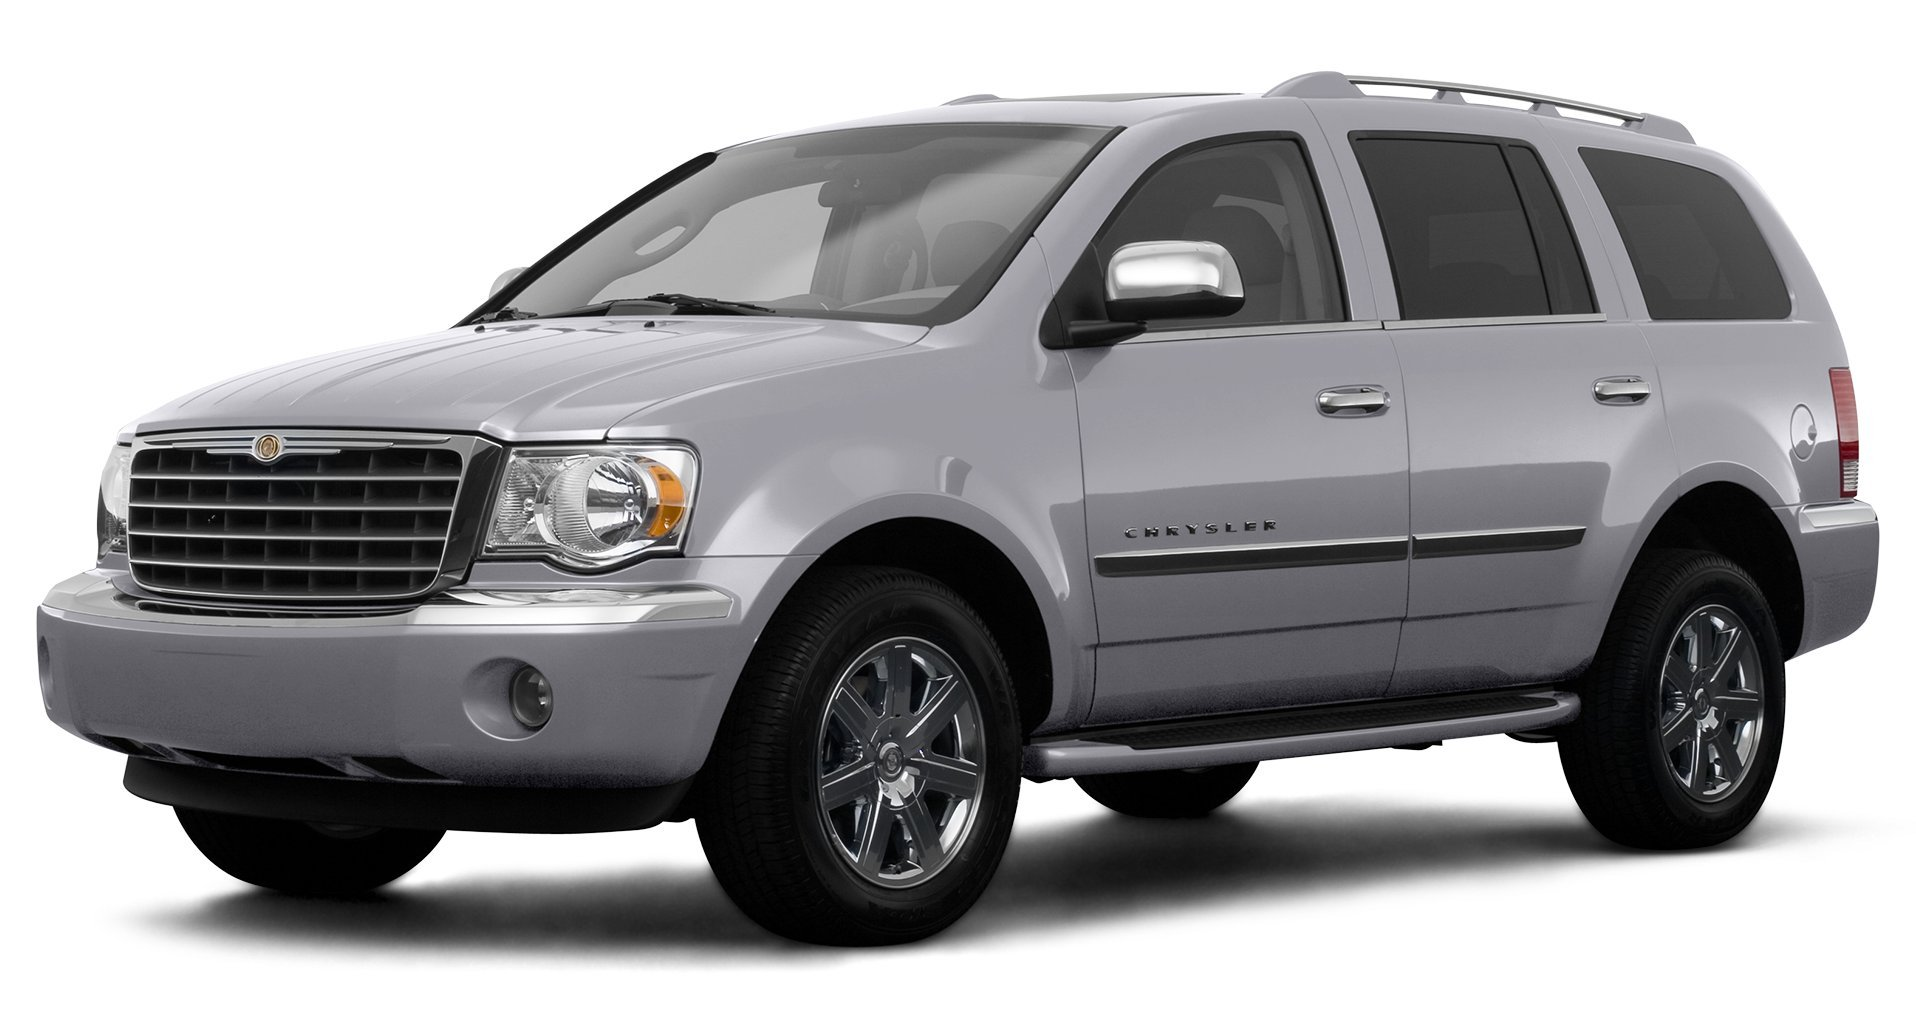 2008 Chrysler Aspen Limited, All Wheel Drive 4-Door ...